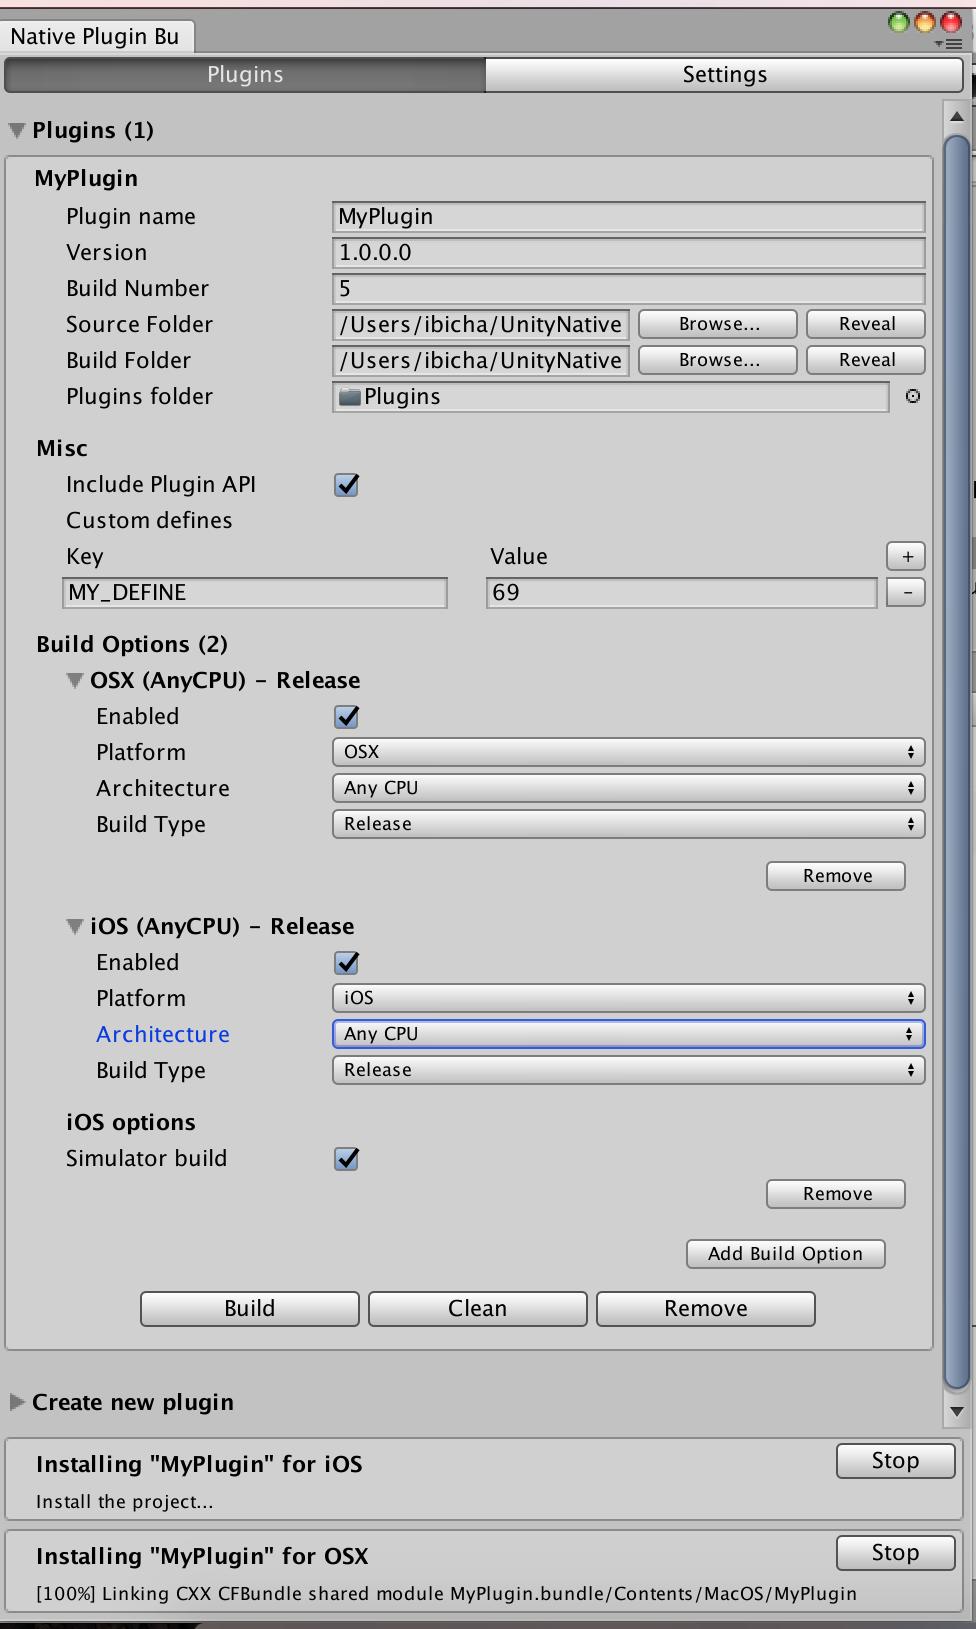 Native Plugin Builder - UnityList